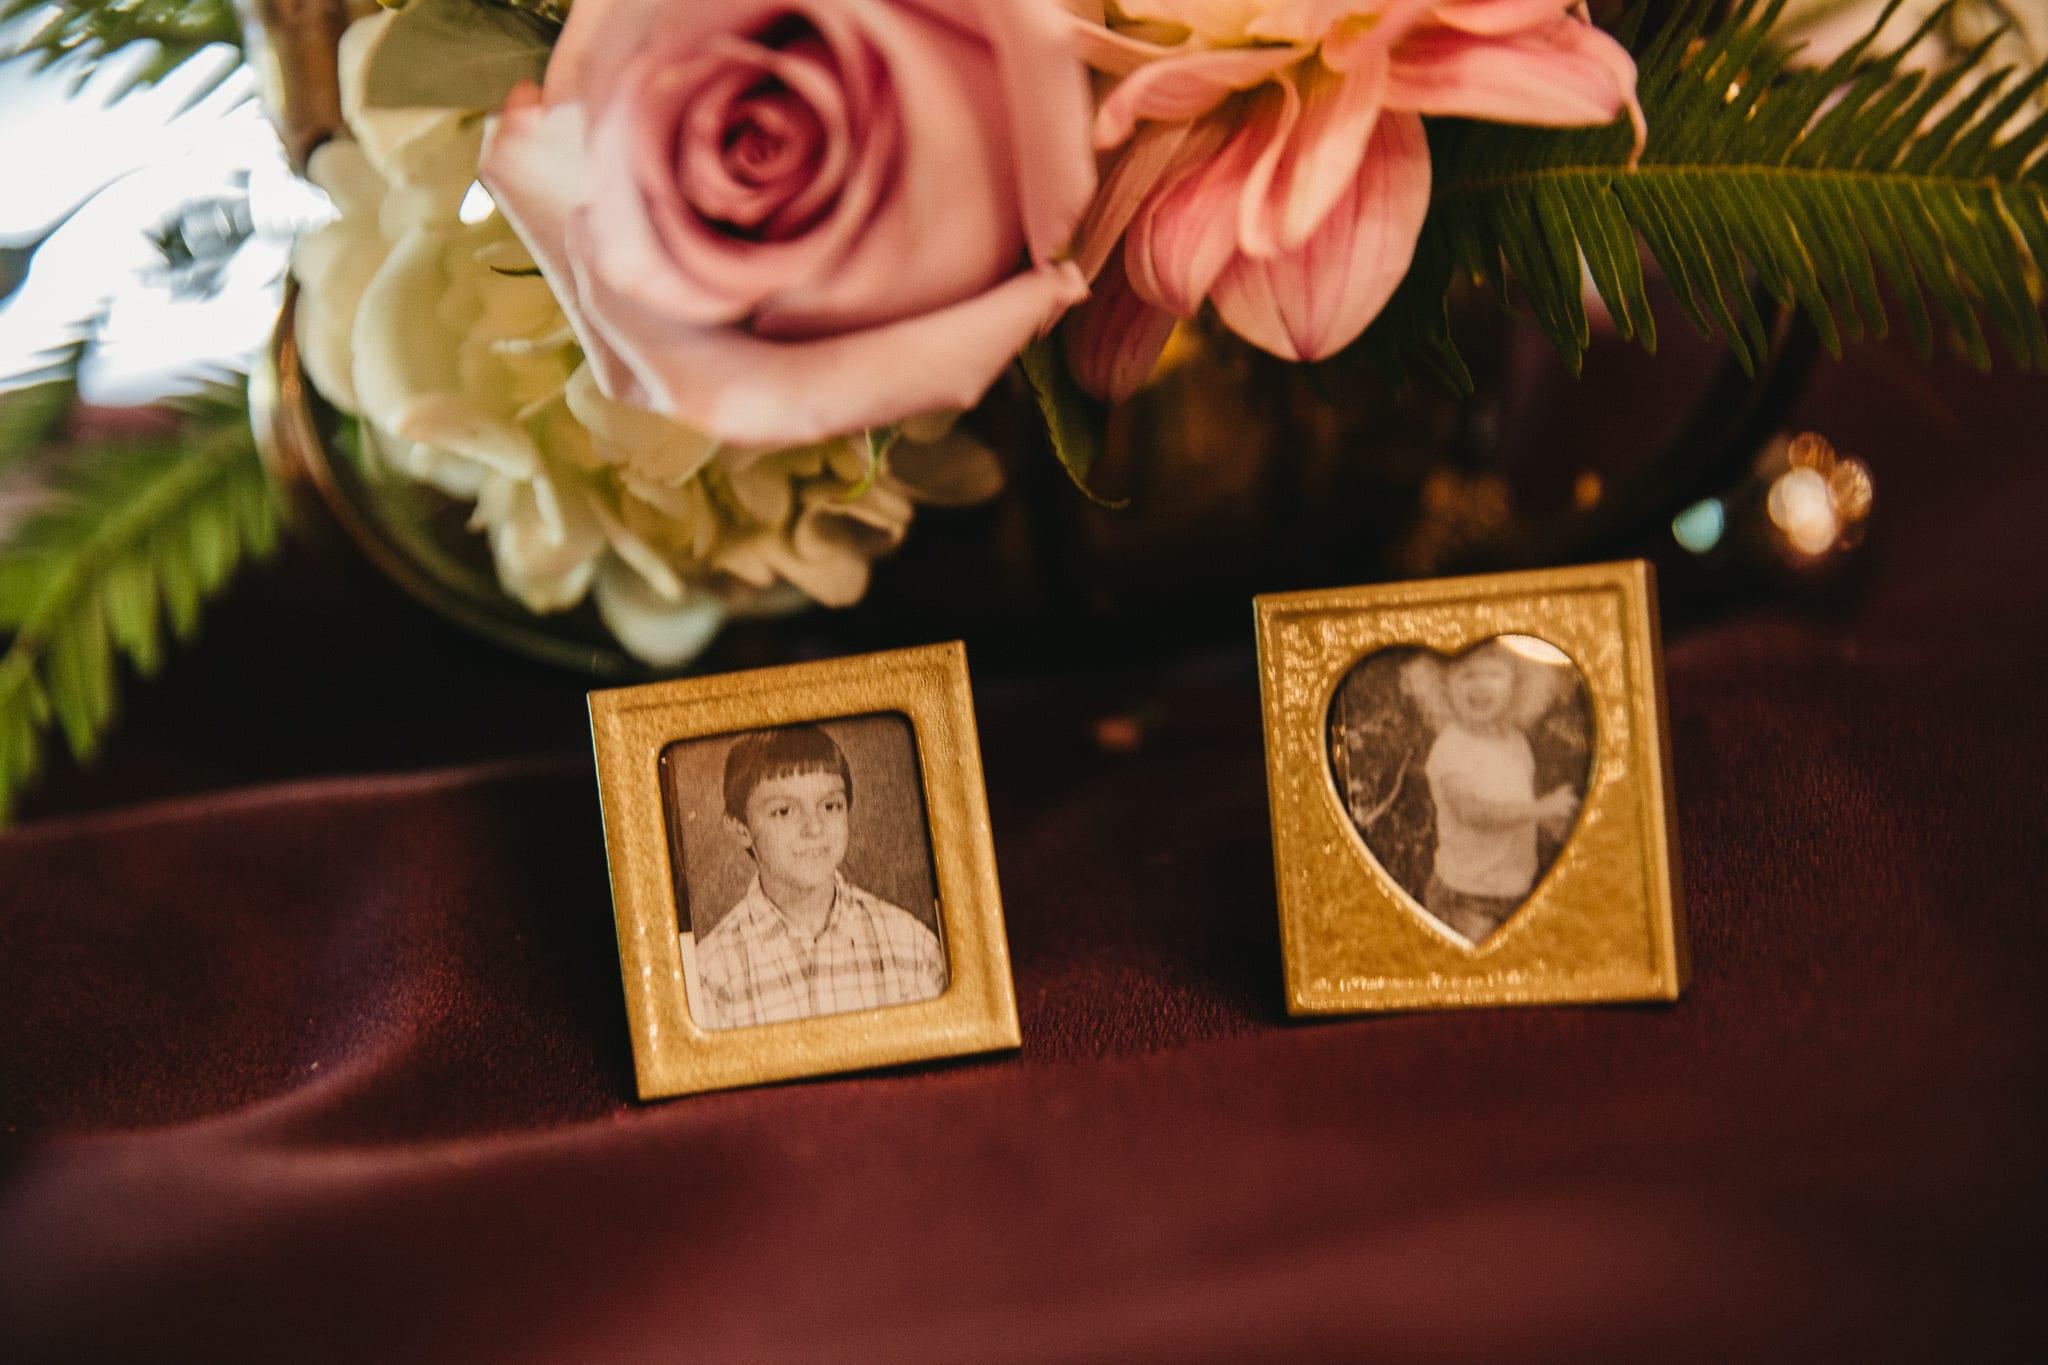 chico-card-center-wedding-photographer-17